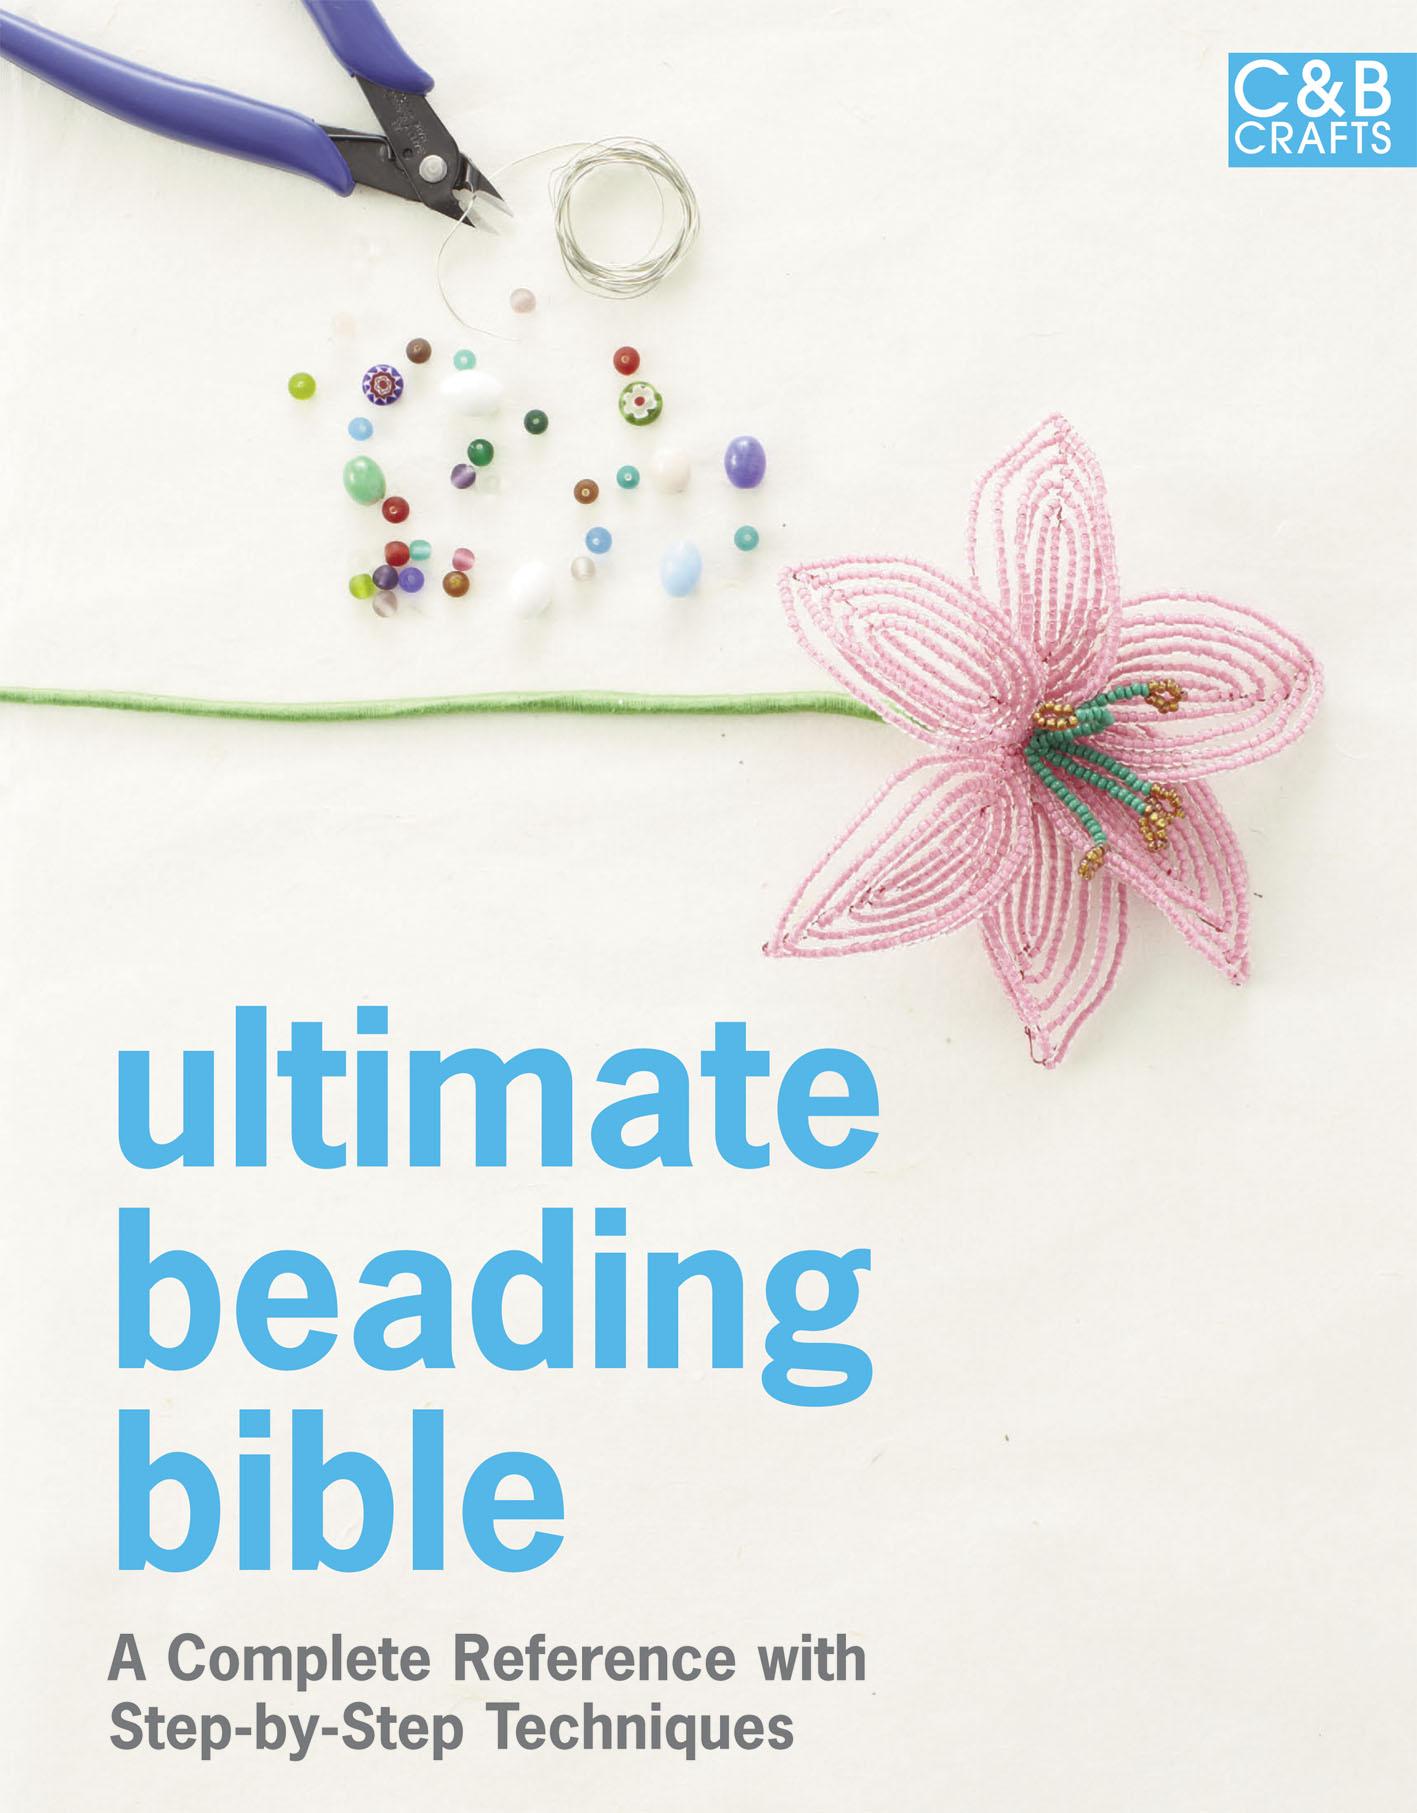 Ultimate Beading Bible